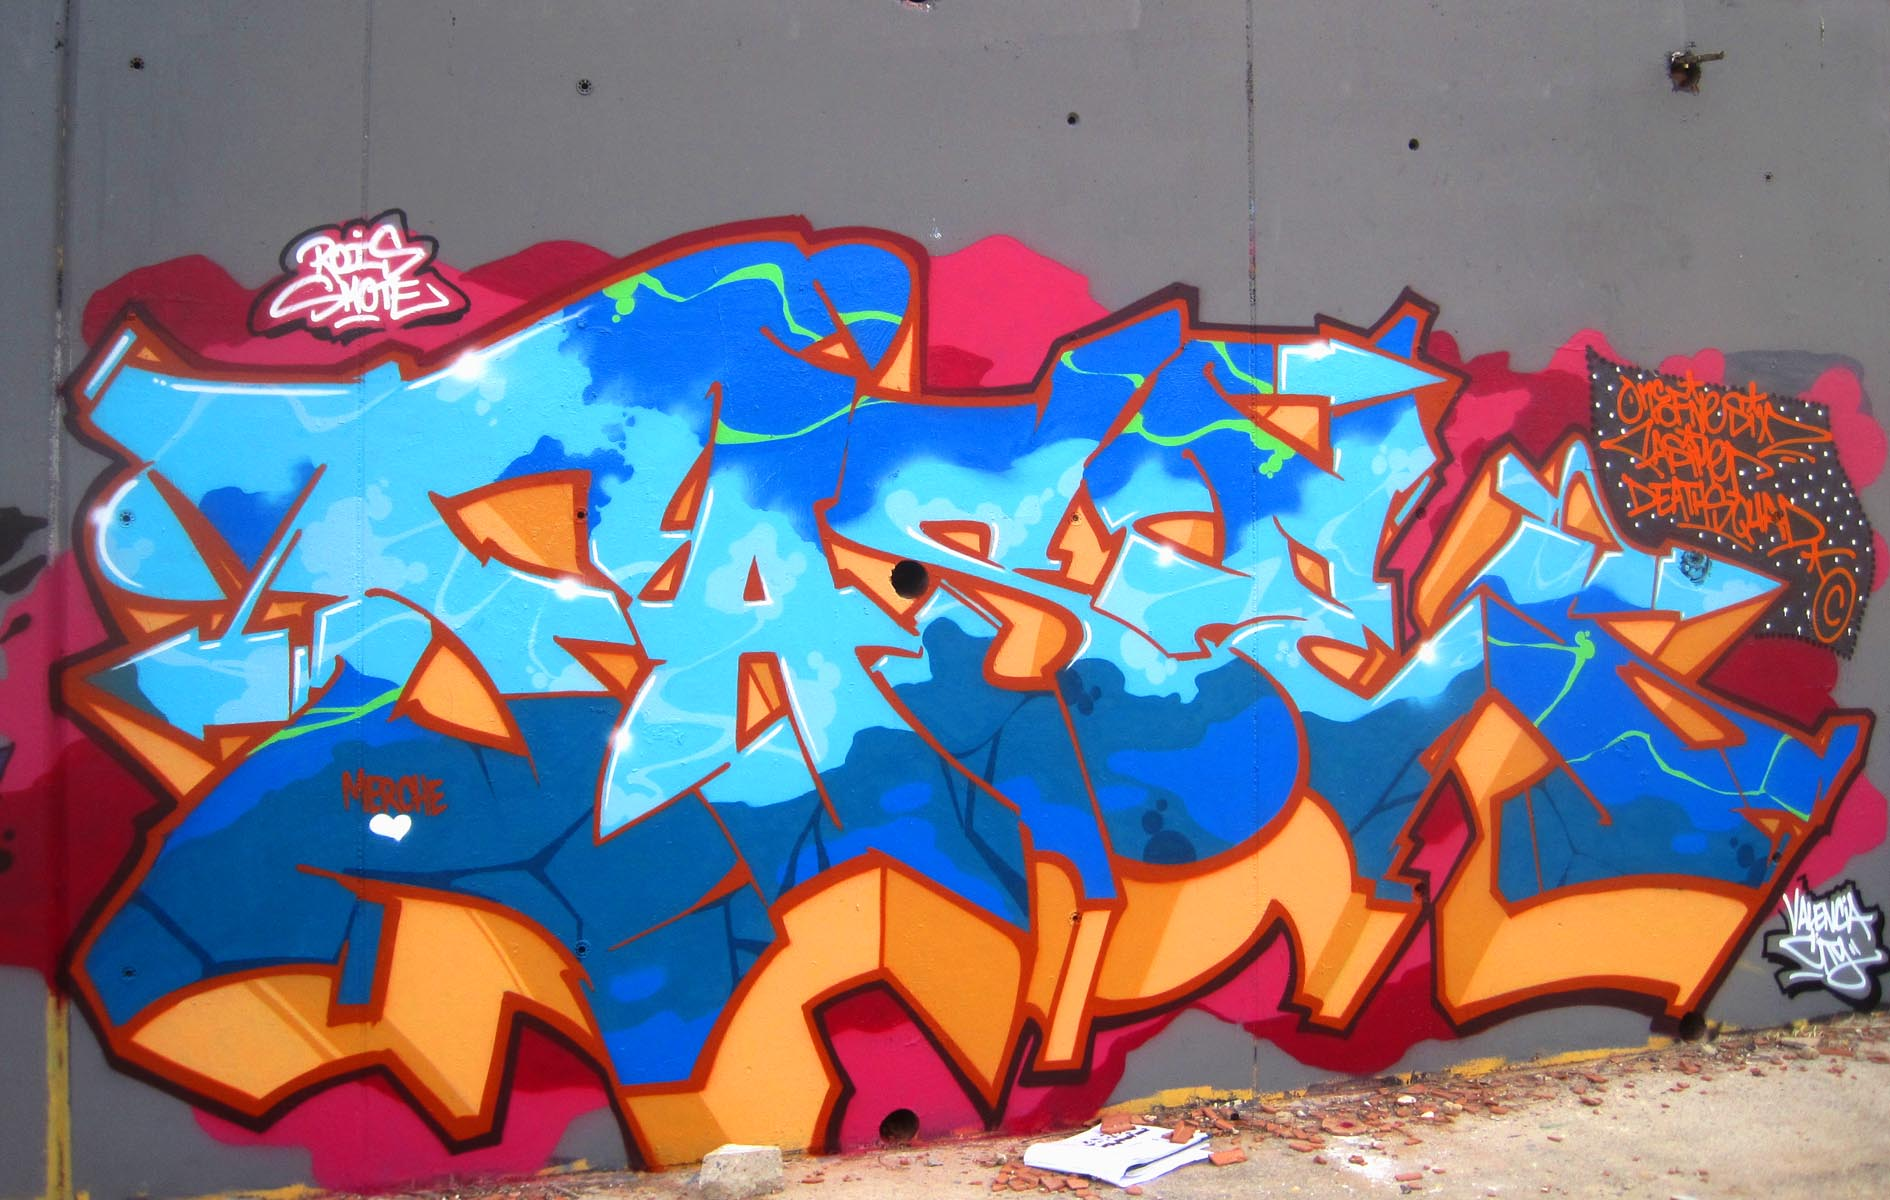 FASE FASIM GRAFFITI VALENCIA 2014 TAVERNES baja